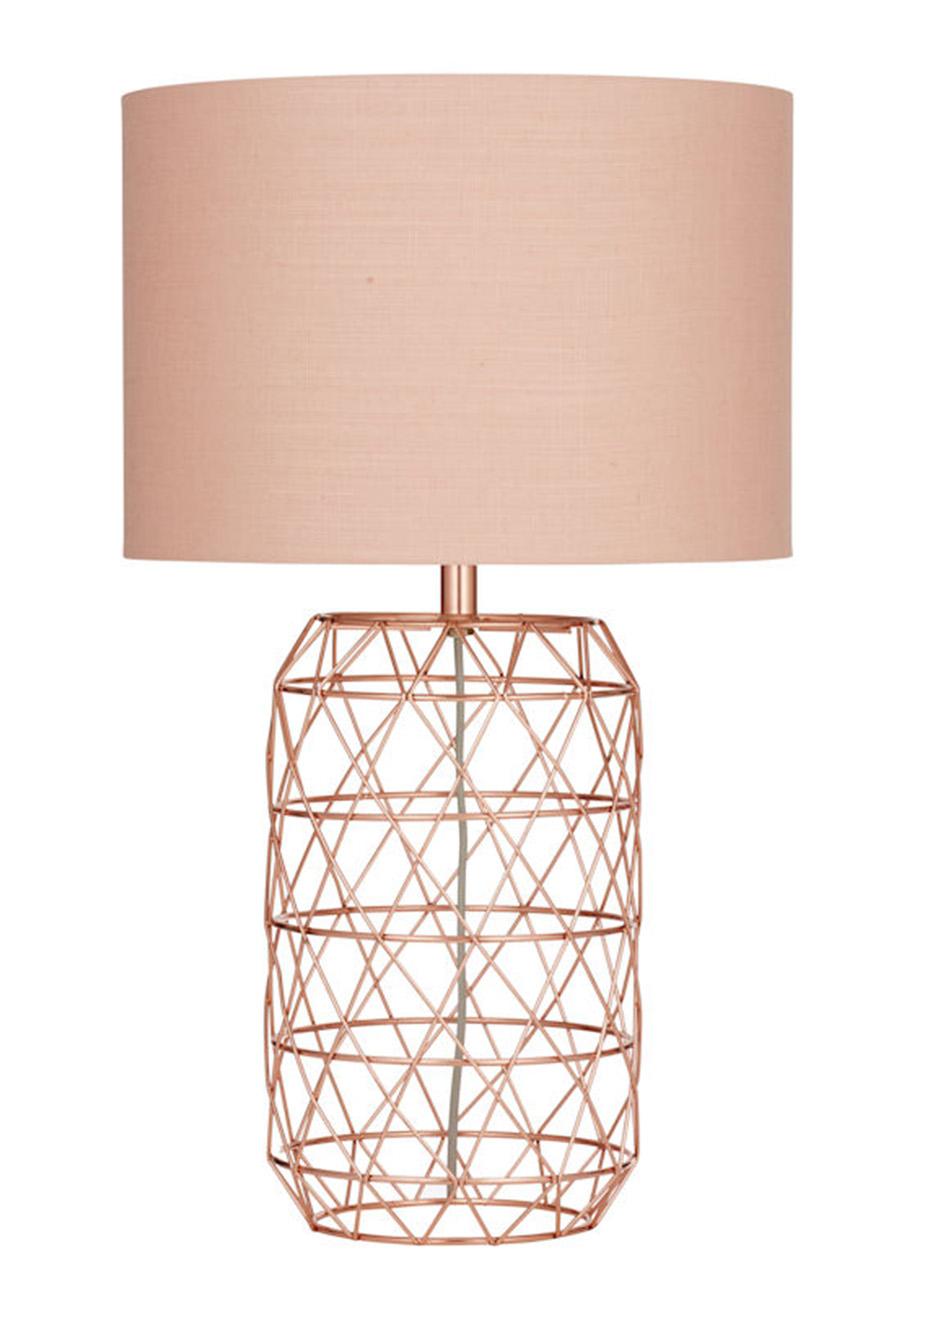 Ezra The Edit Amalfi Blush Onceit Table Metalpink Copper Lamp 13TlFcKJ